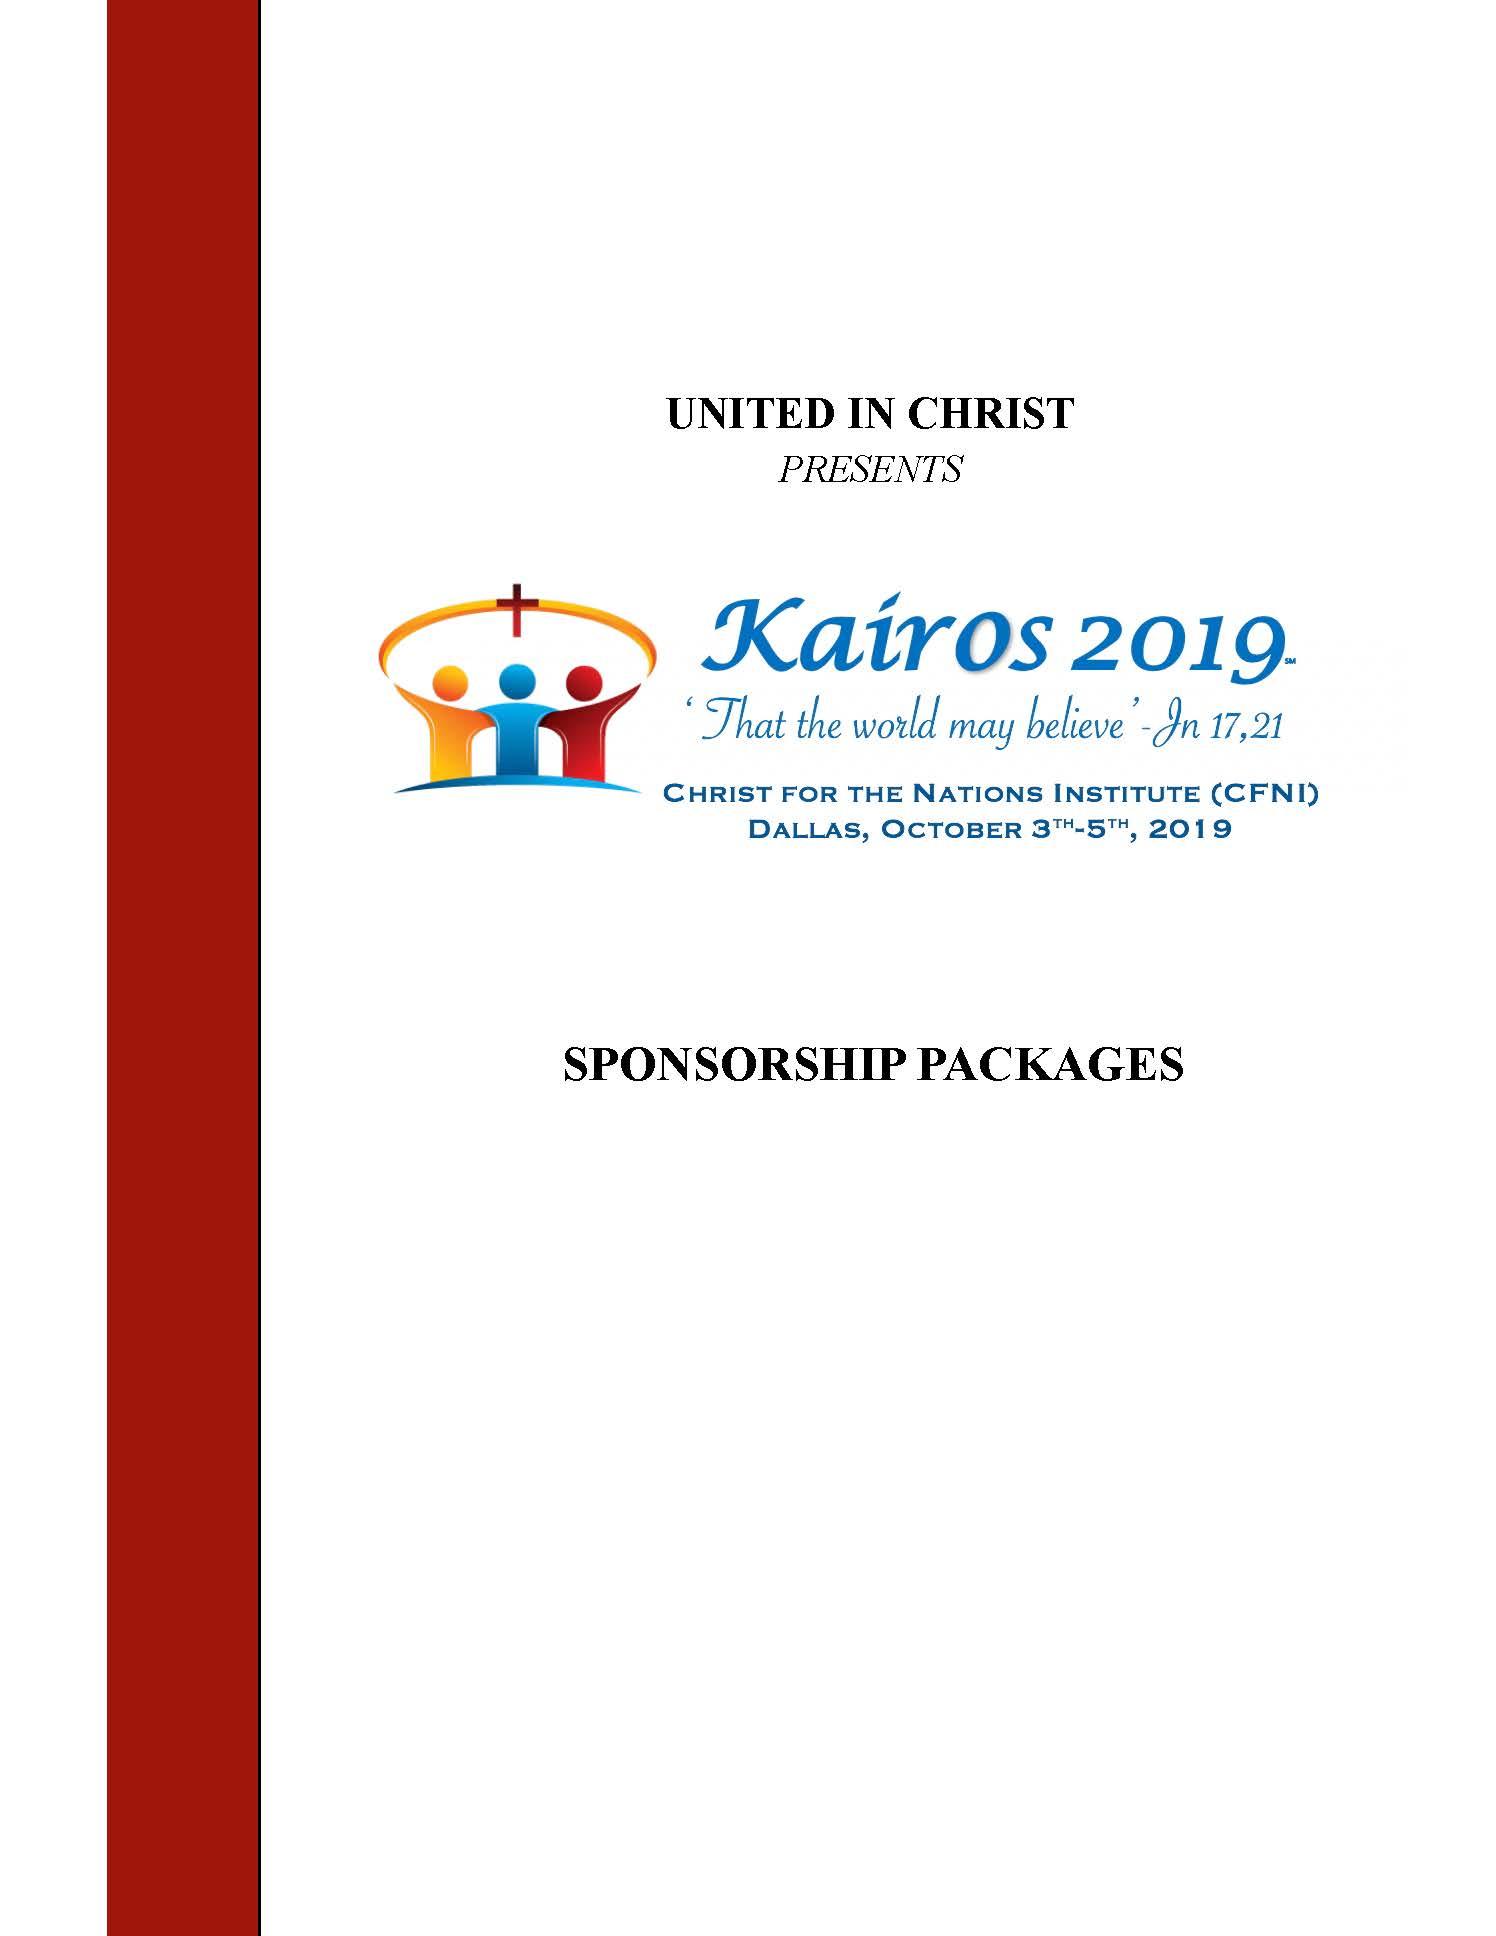 Kairos Sponsorship Letter 2019_Page_1.jpg